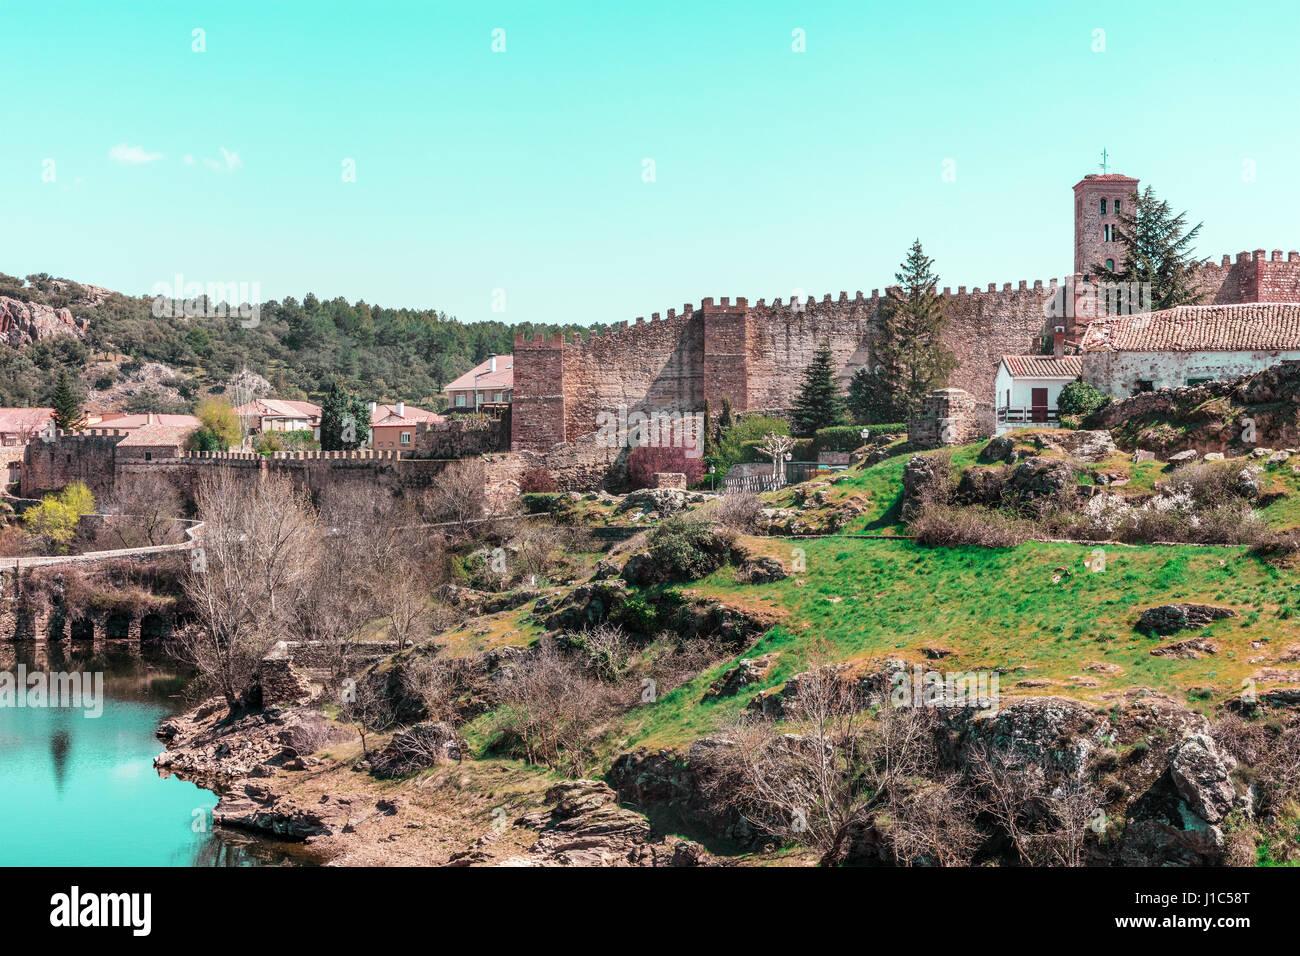 View over small historic town Buitrago de Lozoya in Spain Stock Photo